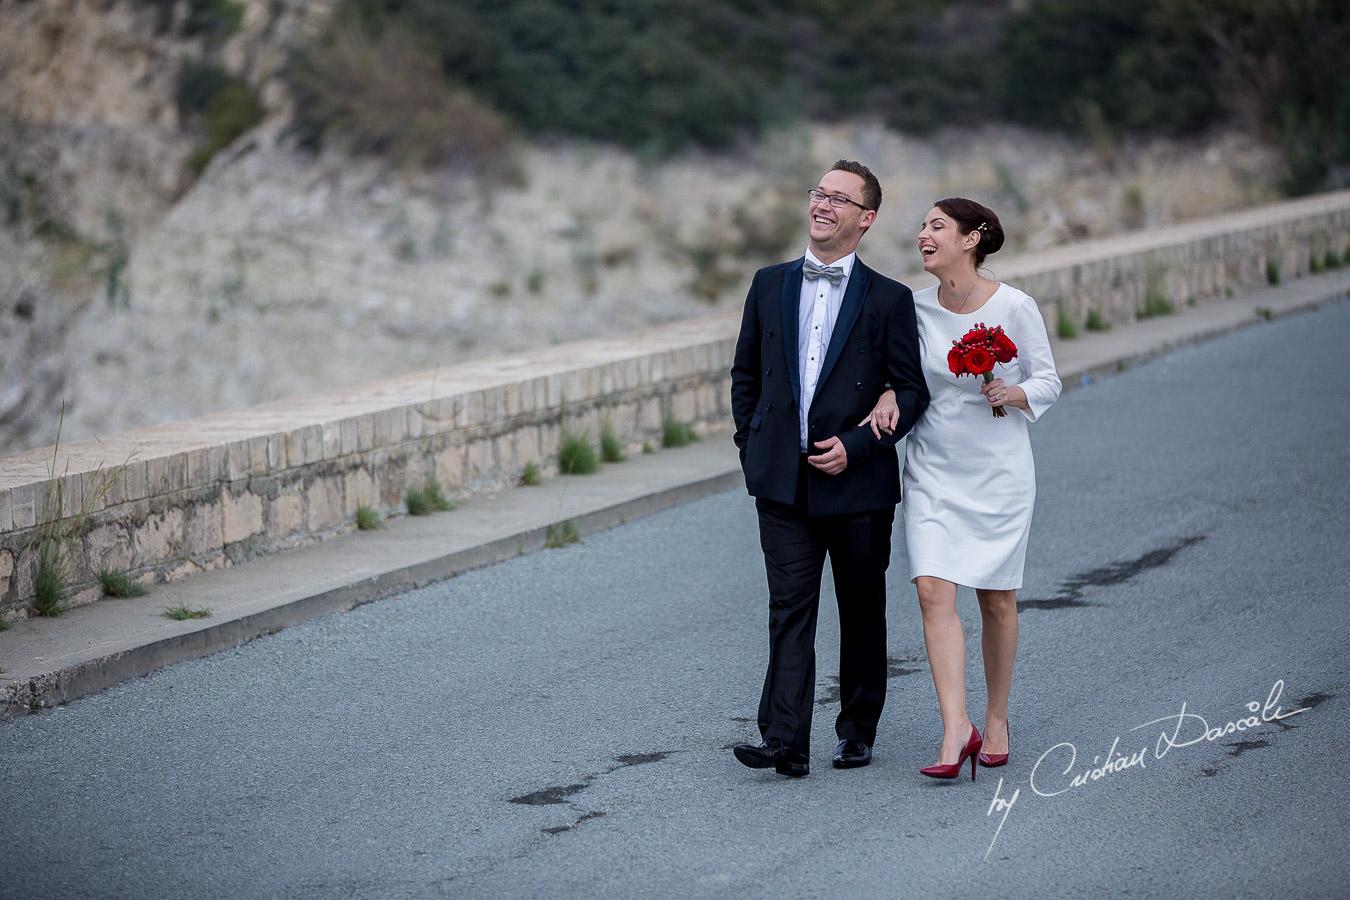 Simple Marriage Ceremony - Irina & Dragos 18